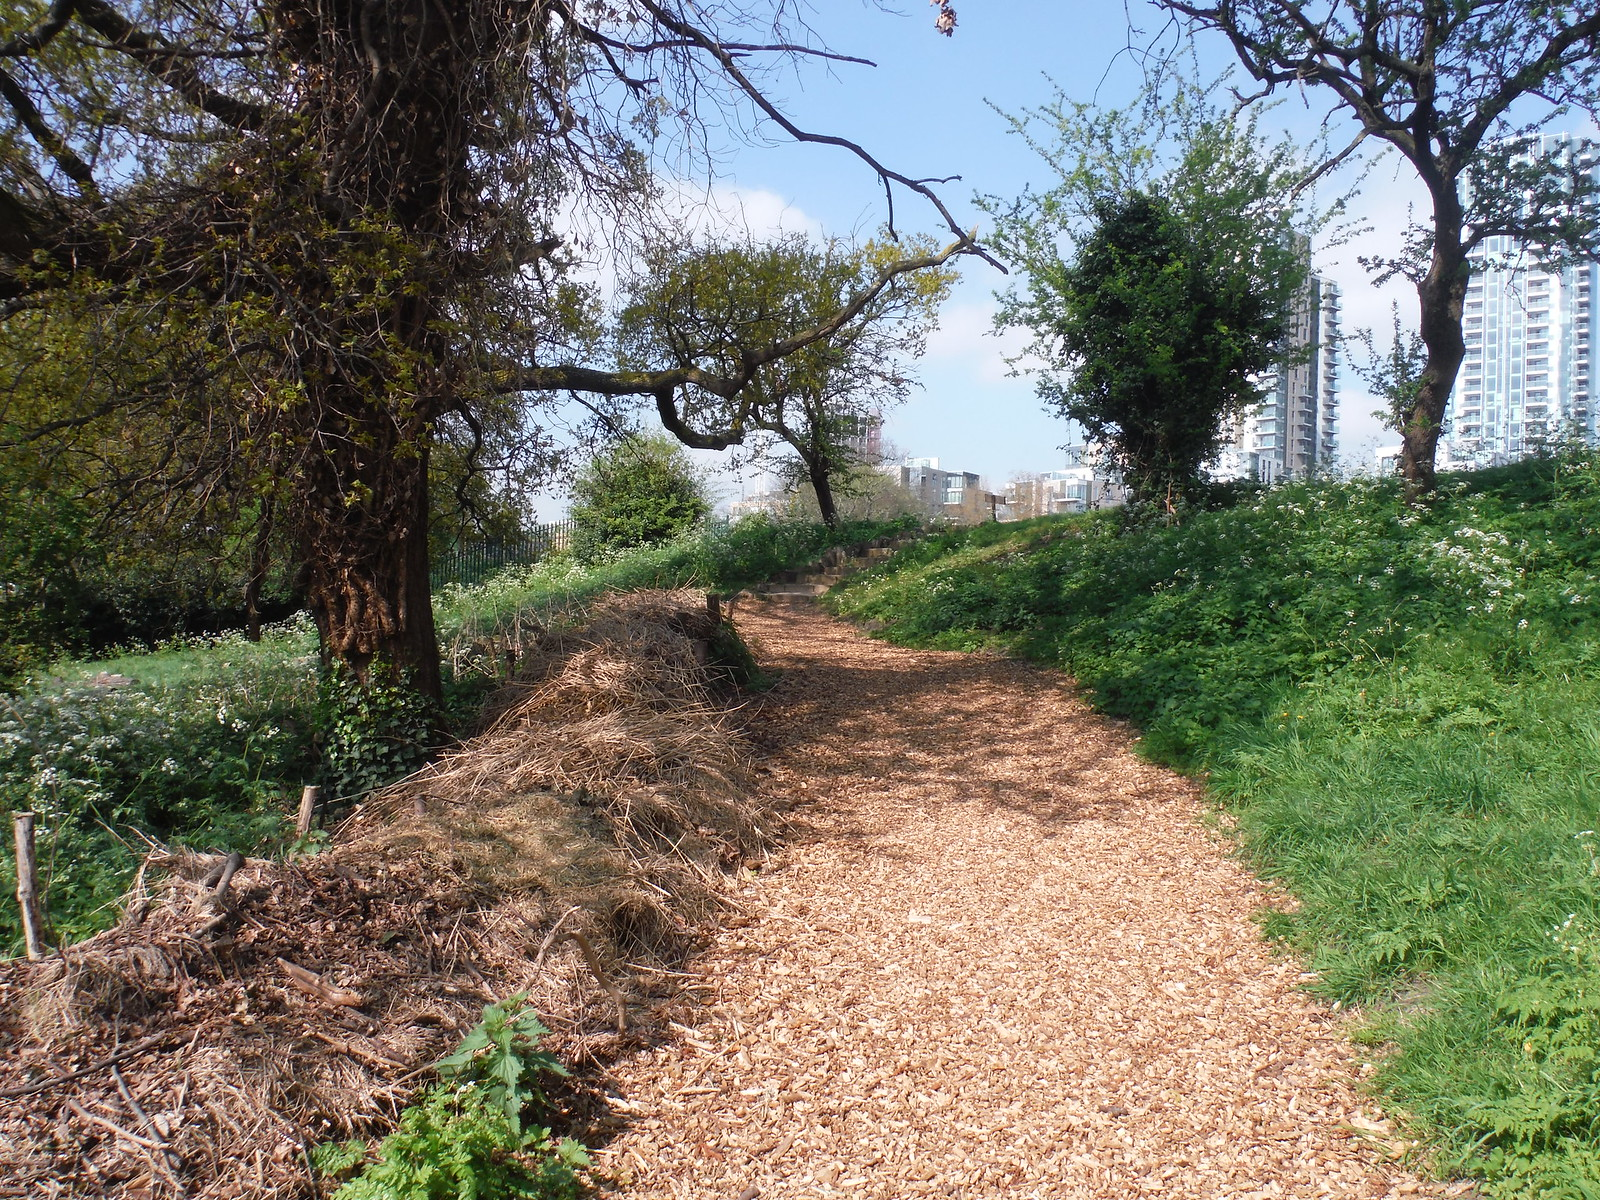 Woodland Trail (II), Woodberry Wetlands SWC Short Walk 26 - Woodberry Wetlands (Stoke Newington Reservoirs)